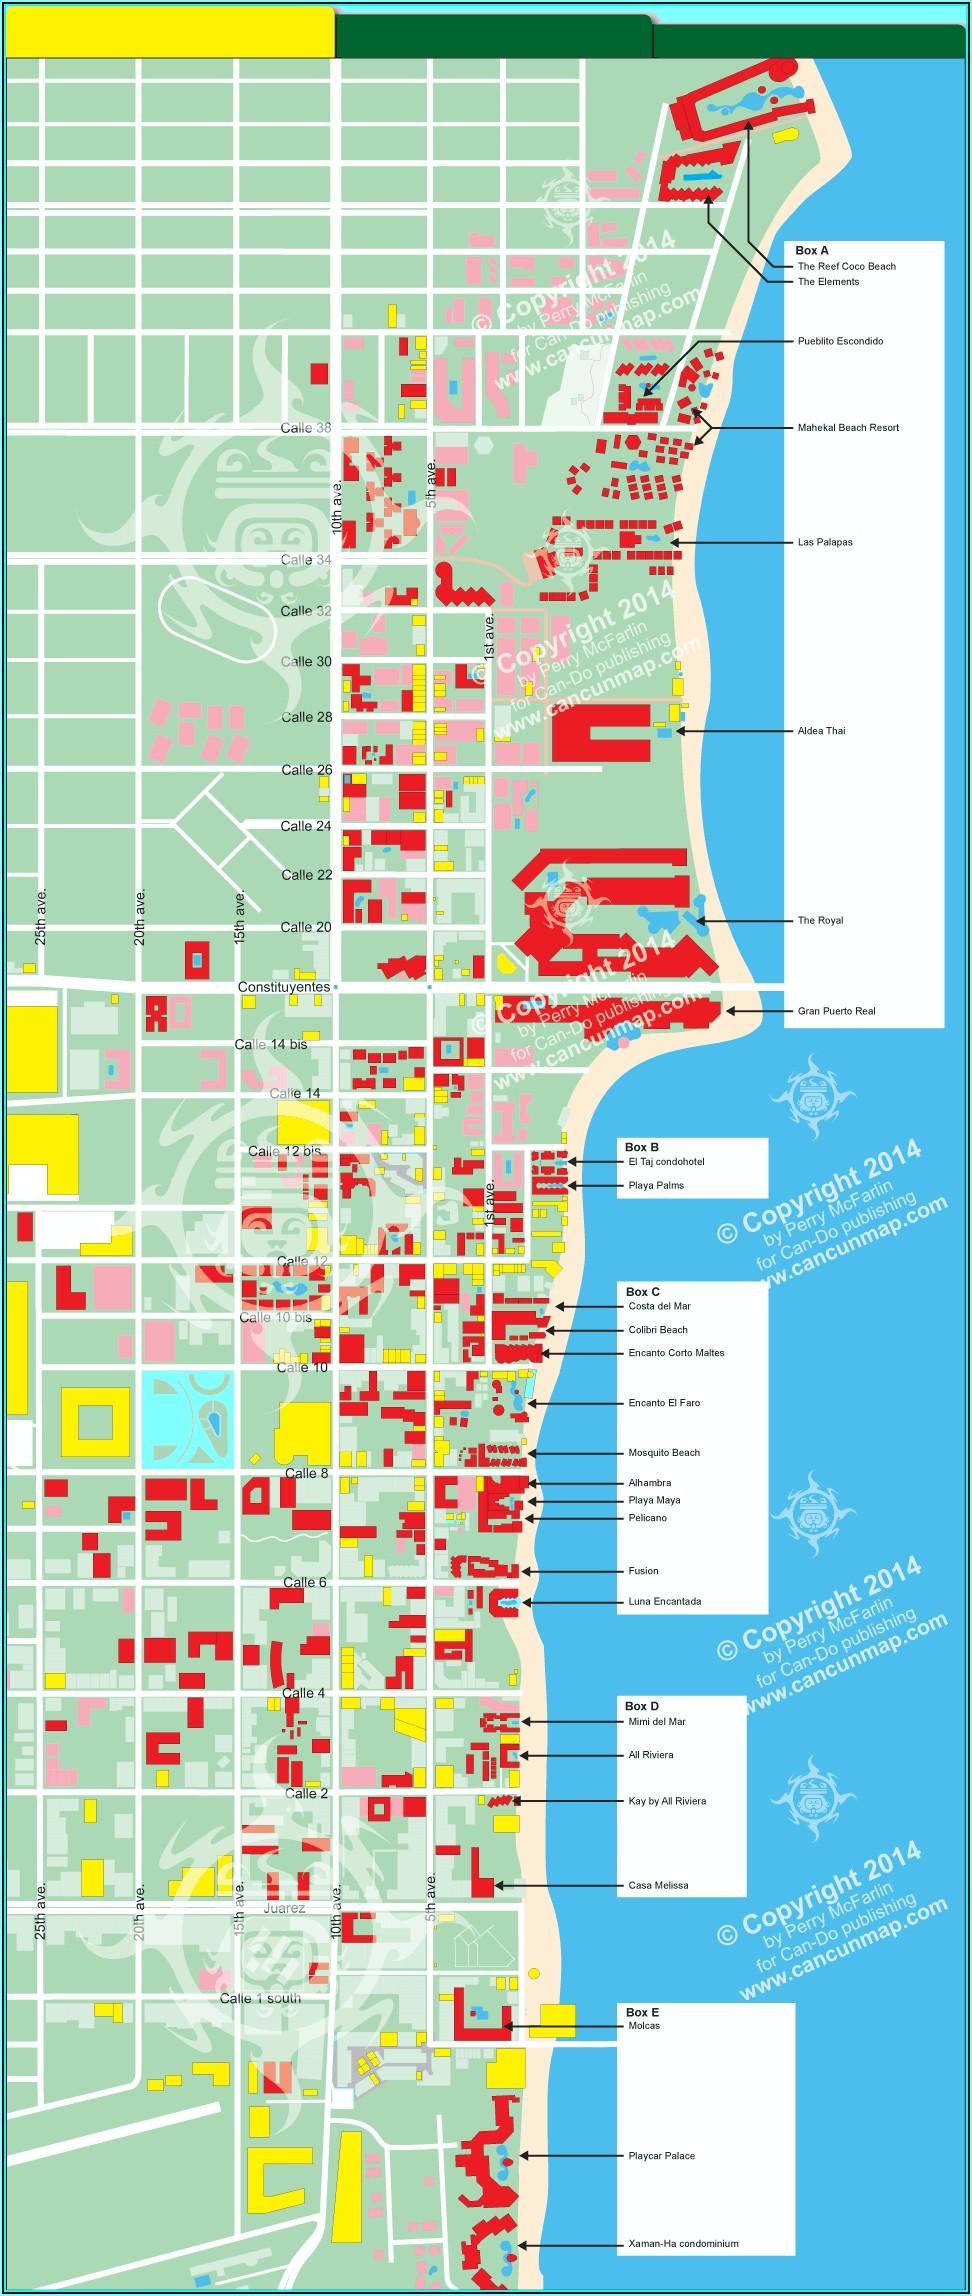 Map Of Hotels Playa Del Carmen Mexico